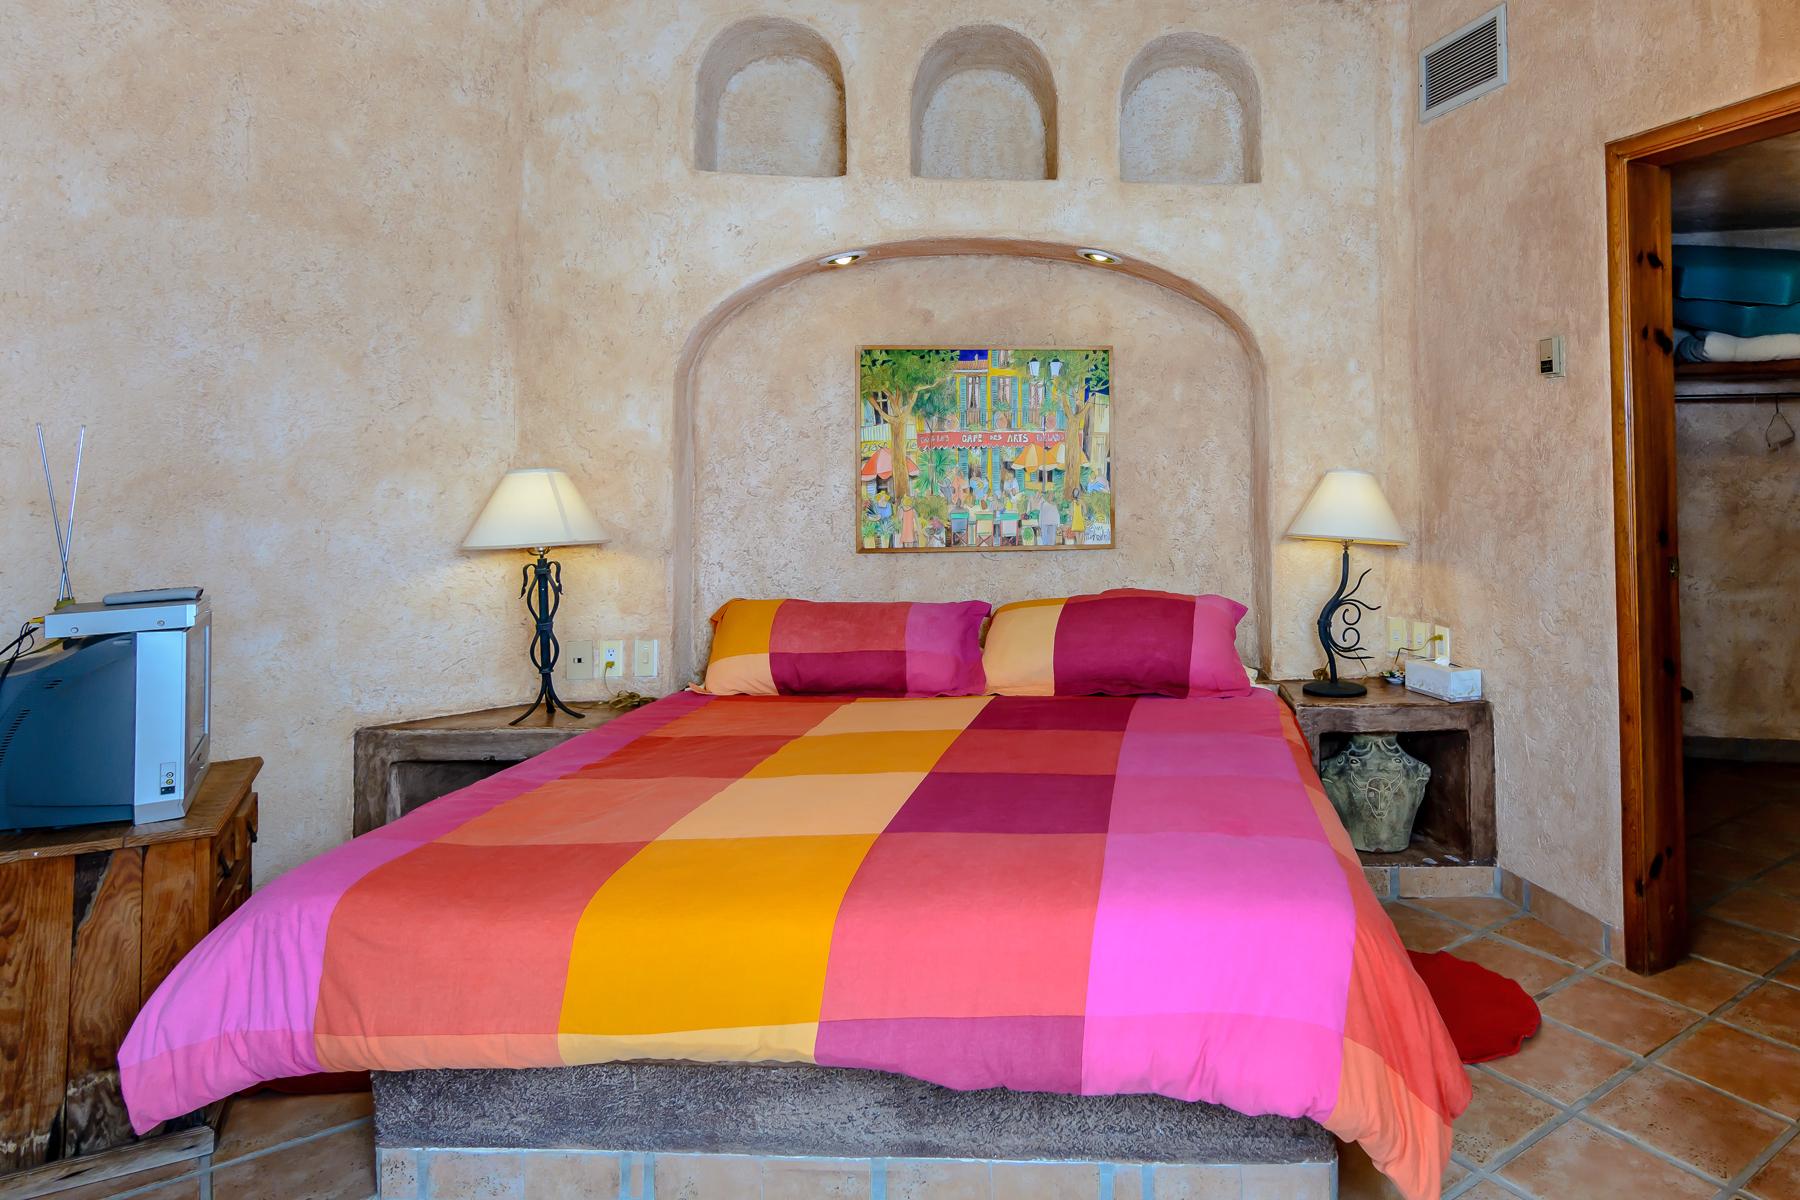 Additional photo for property listing at Casa de la Playa San Jose Del Cabo, Baja California Sur México